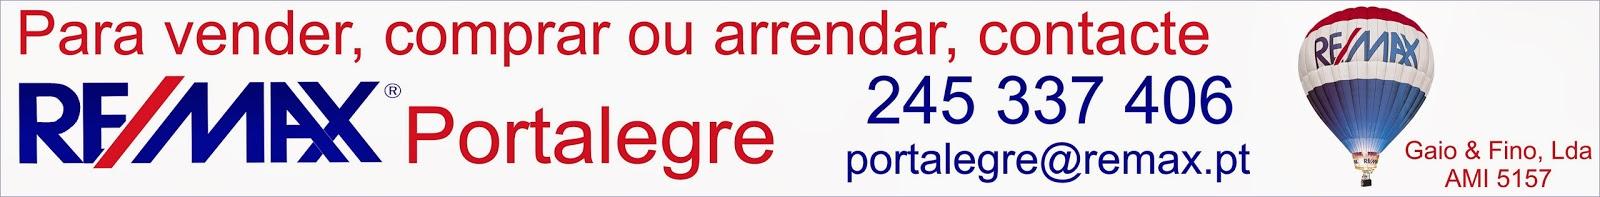 http://www.remax.pt/portalegre